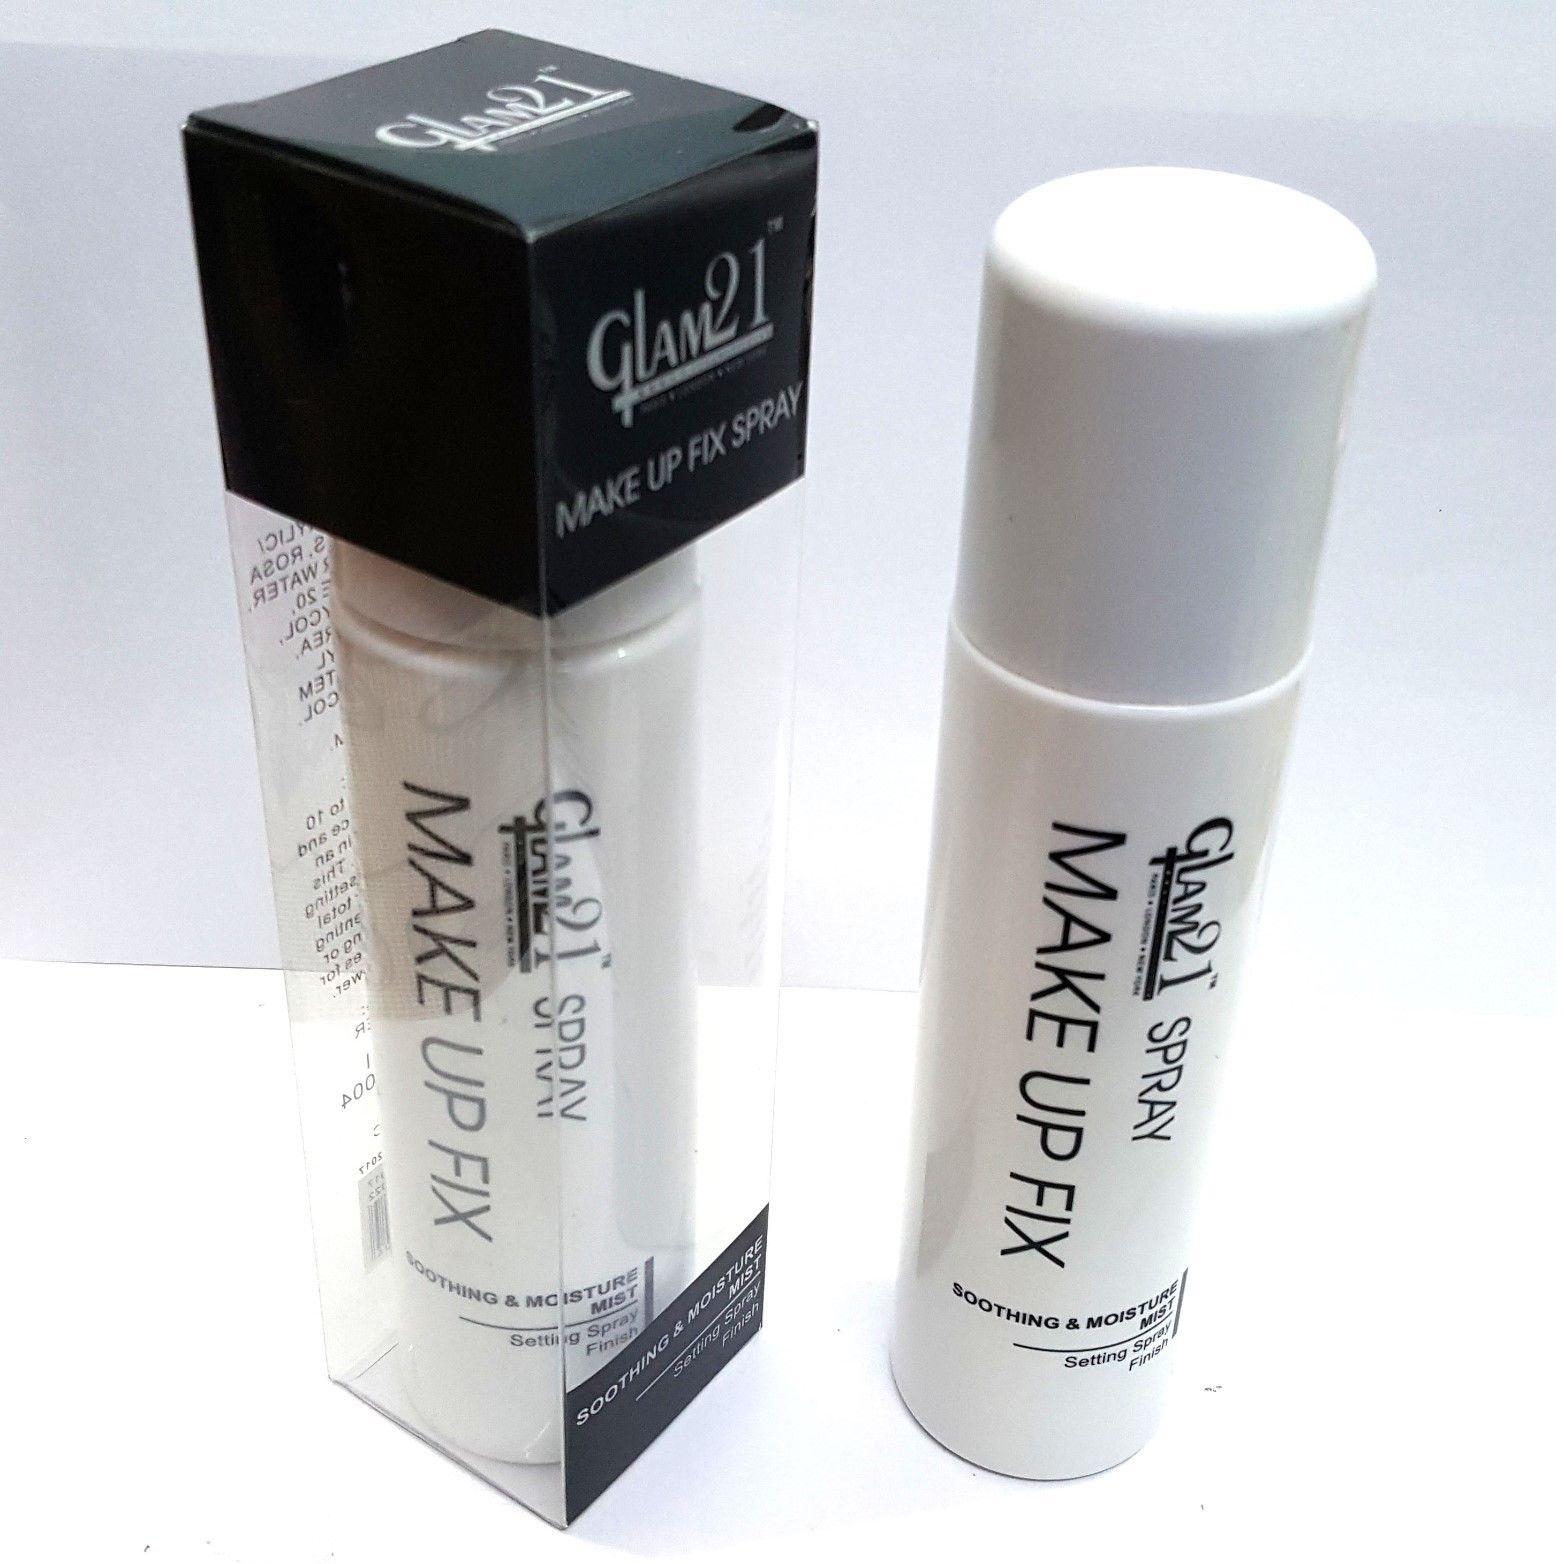 Glam21 Makup Fixer setting spray